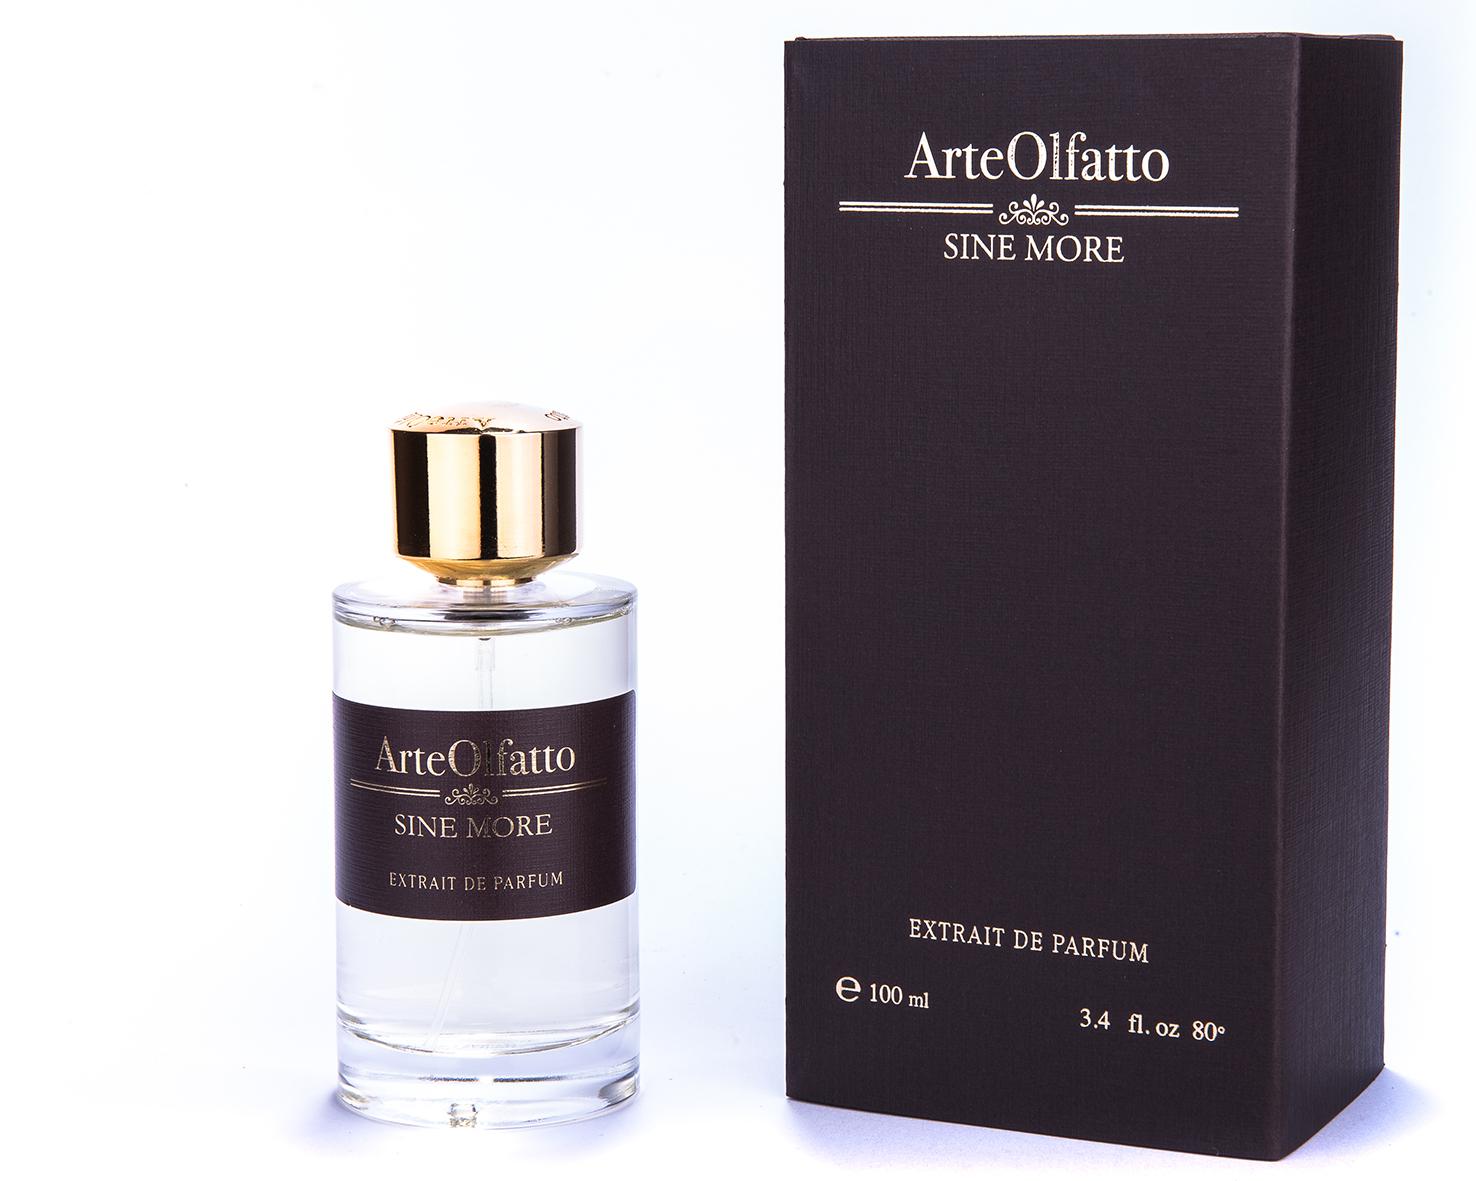 ArteOlfatto – Sine More - Extrait de Parfum 100ml